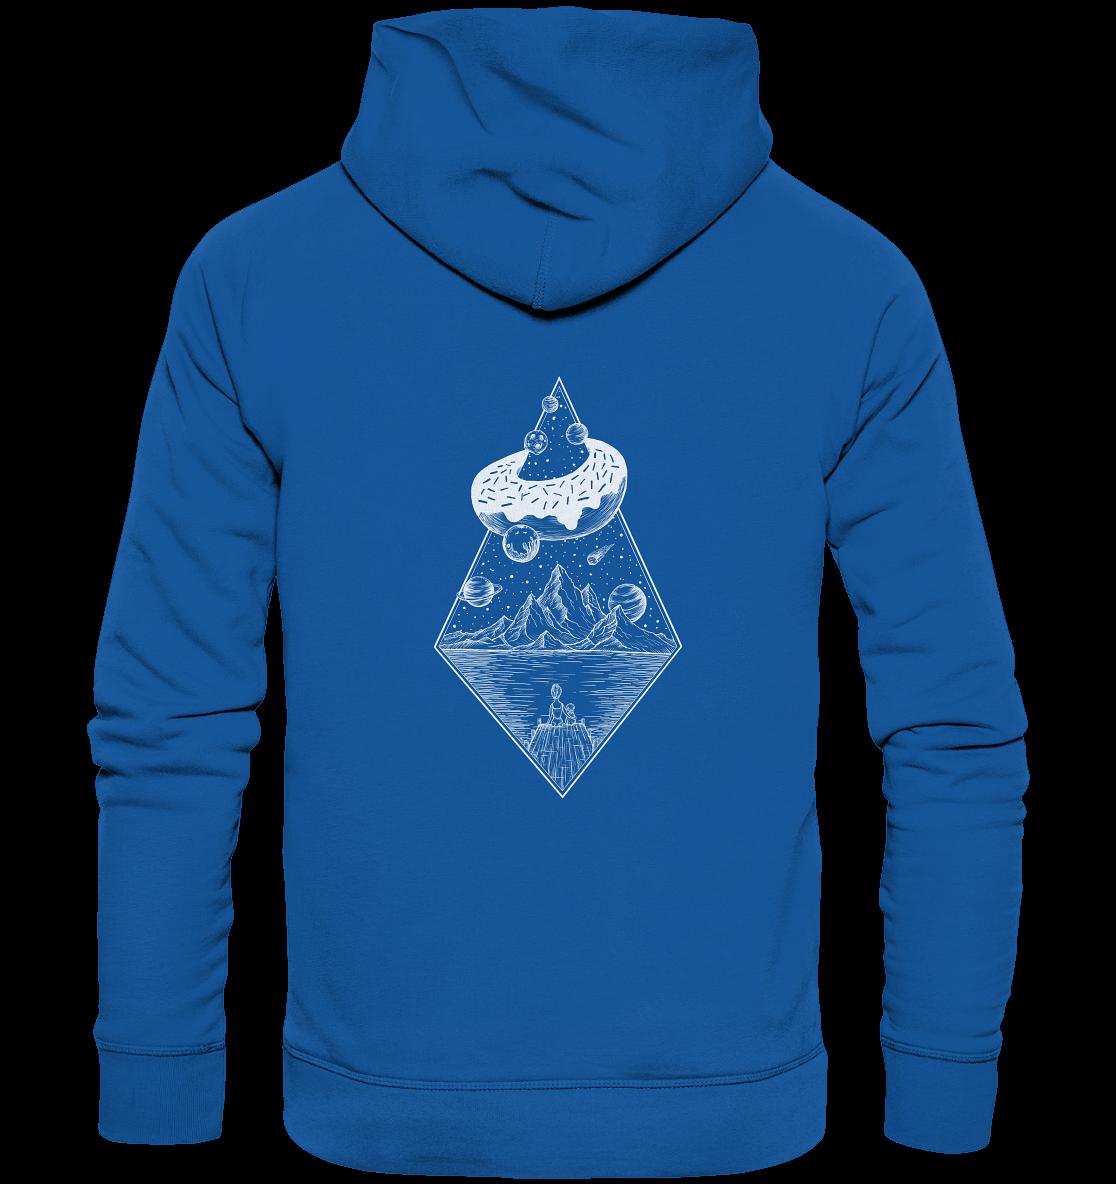 back-organic-hoodie-13569c-1116x.png